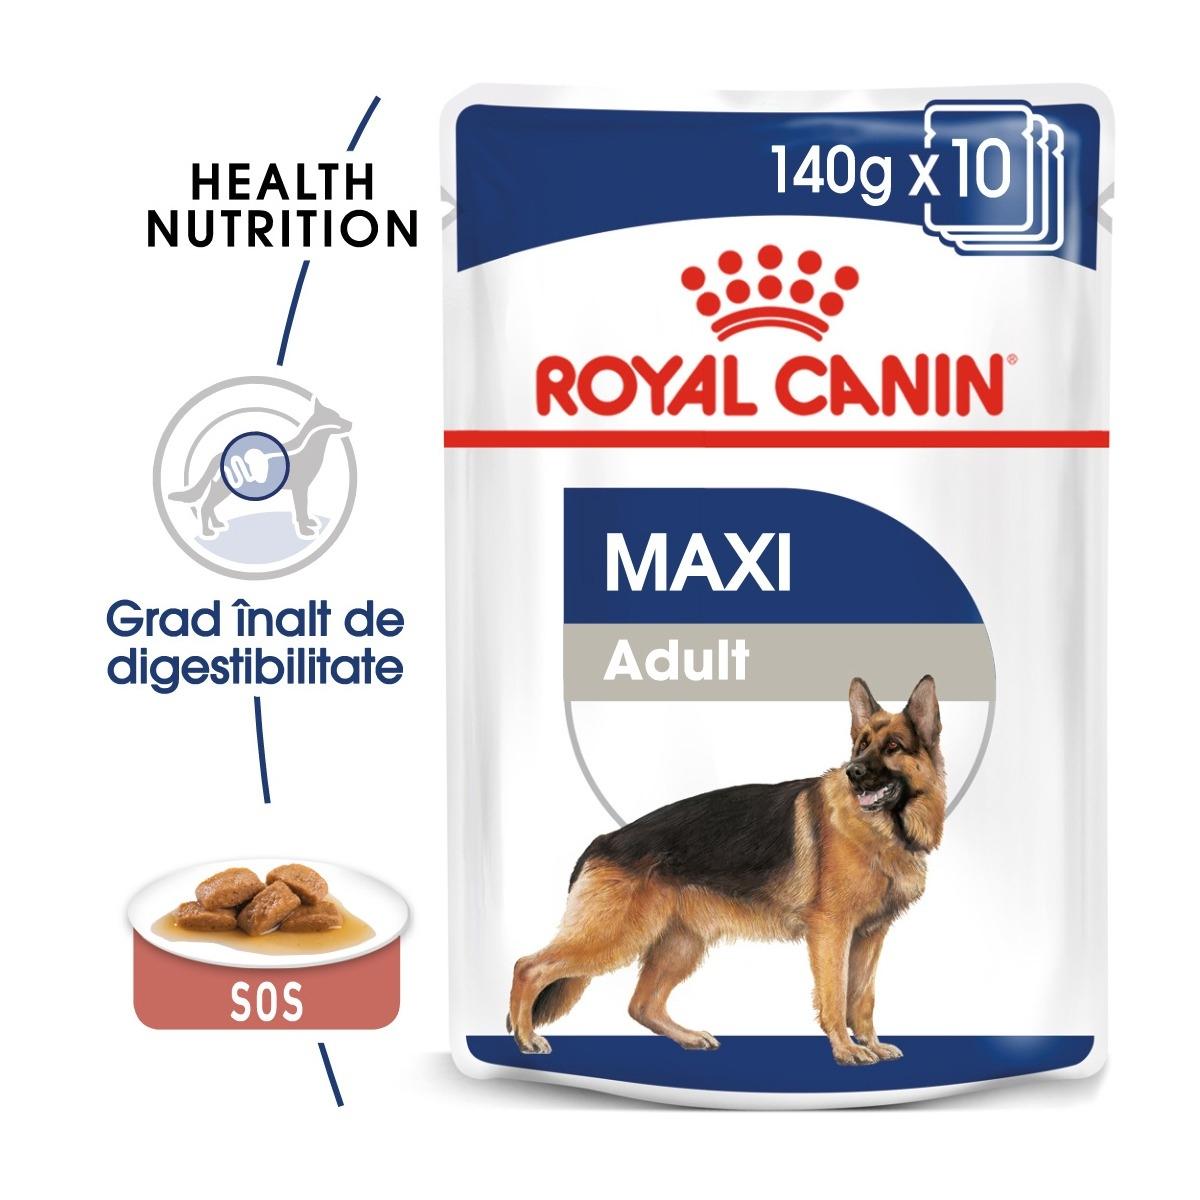 Royal Canin Maxi Adult, 10 x 140 g imagine